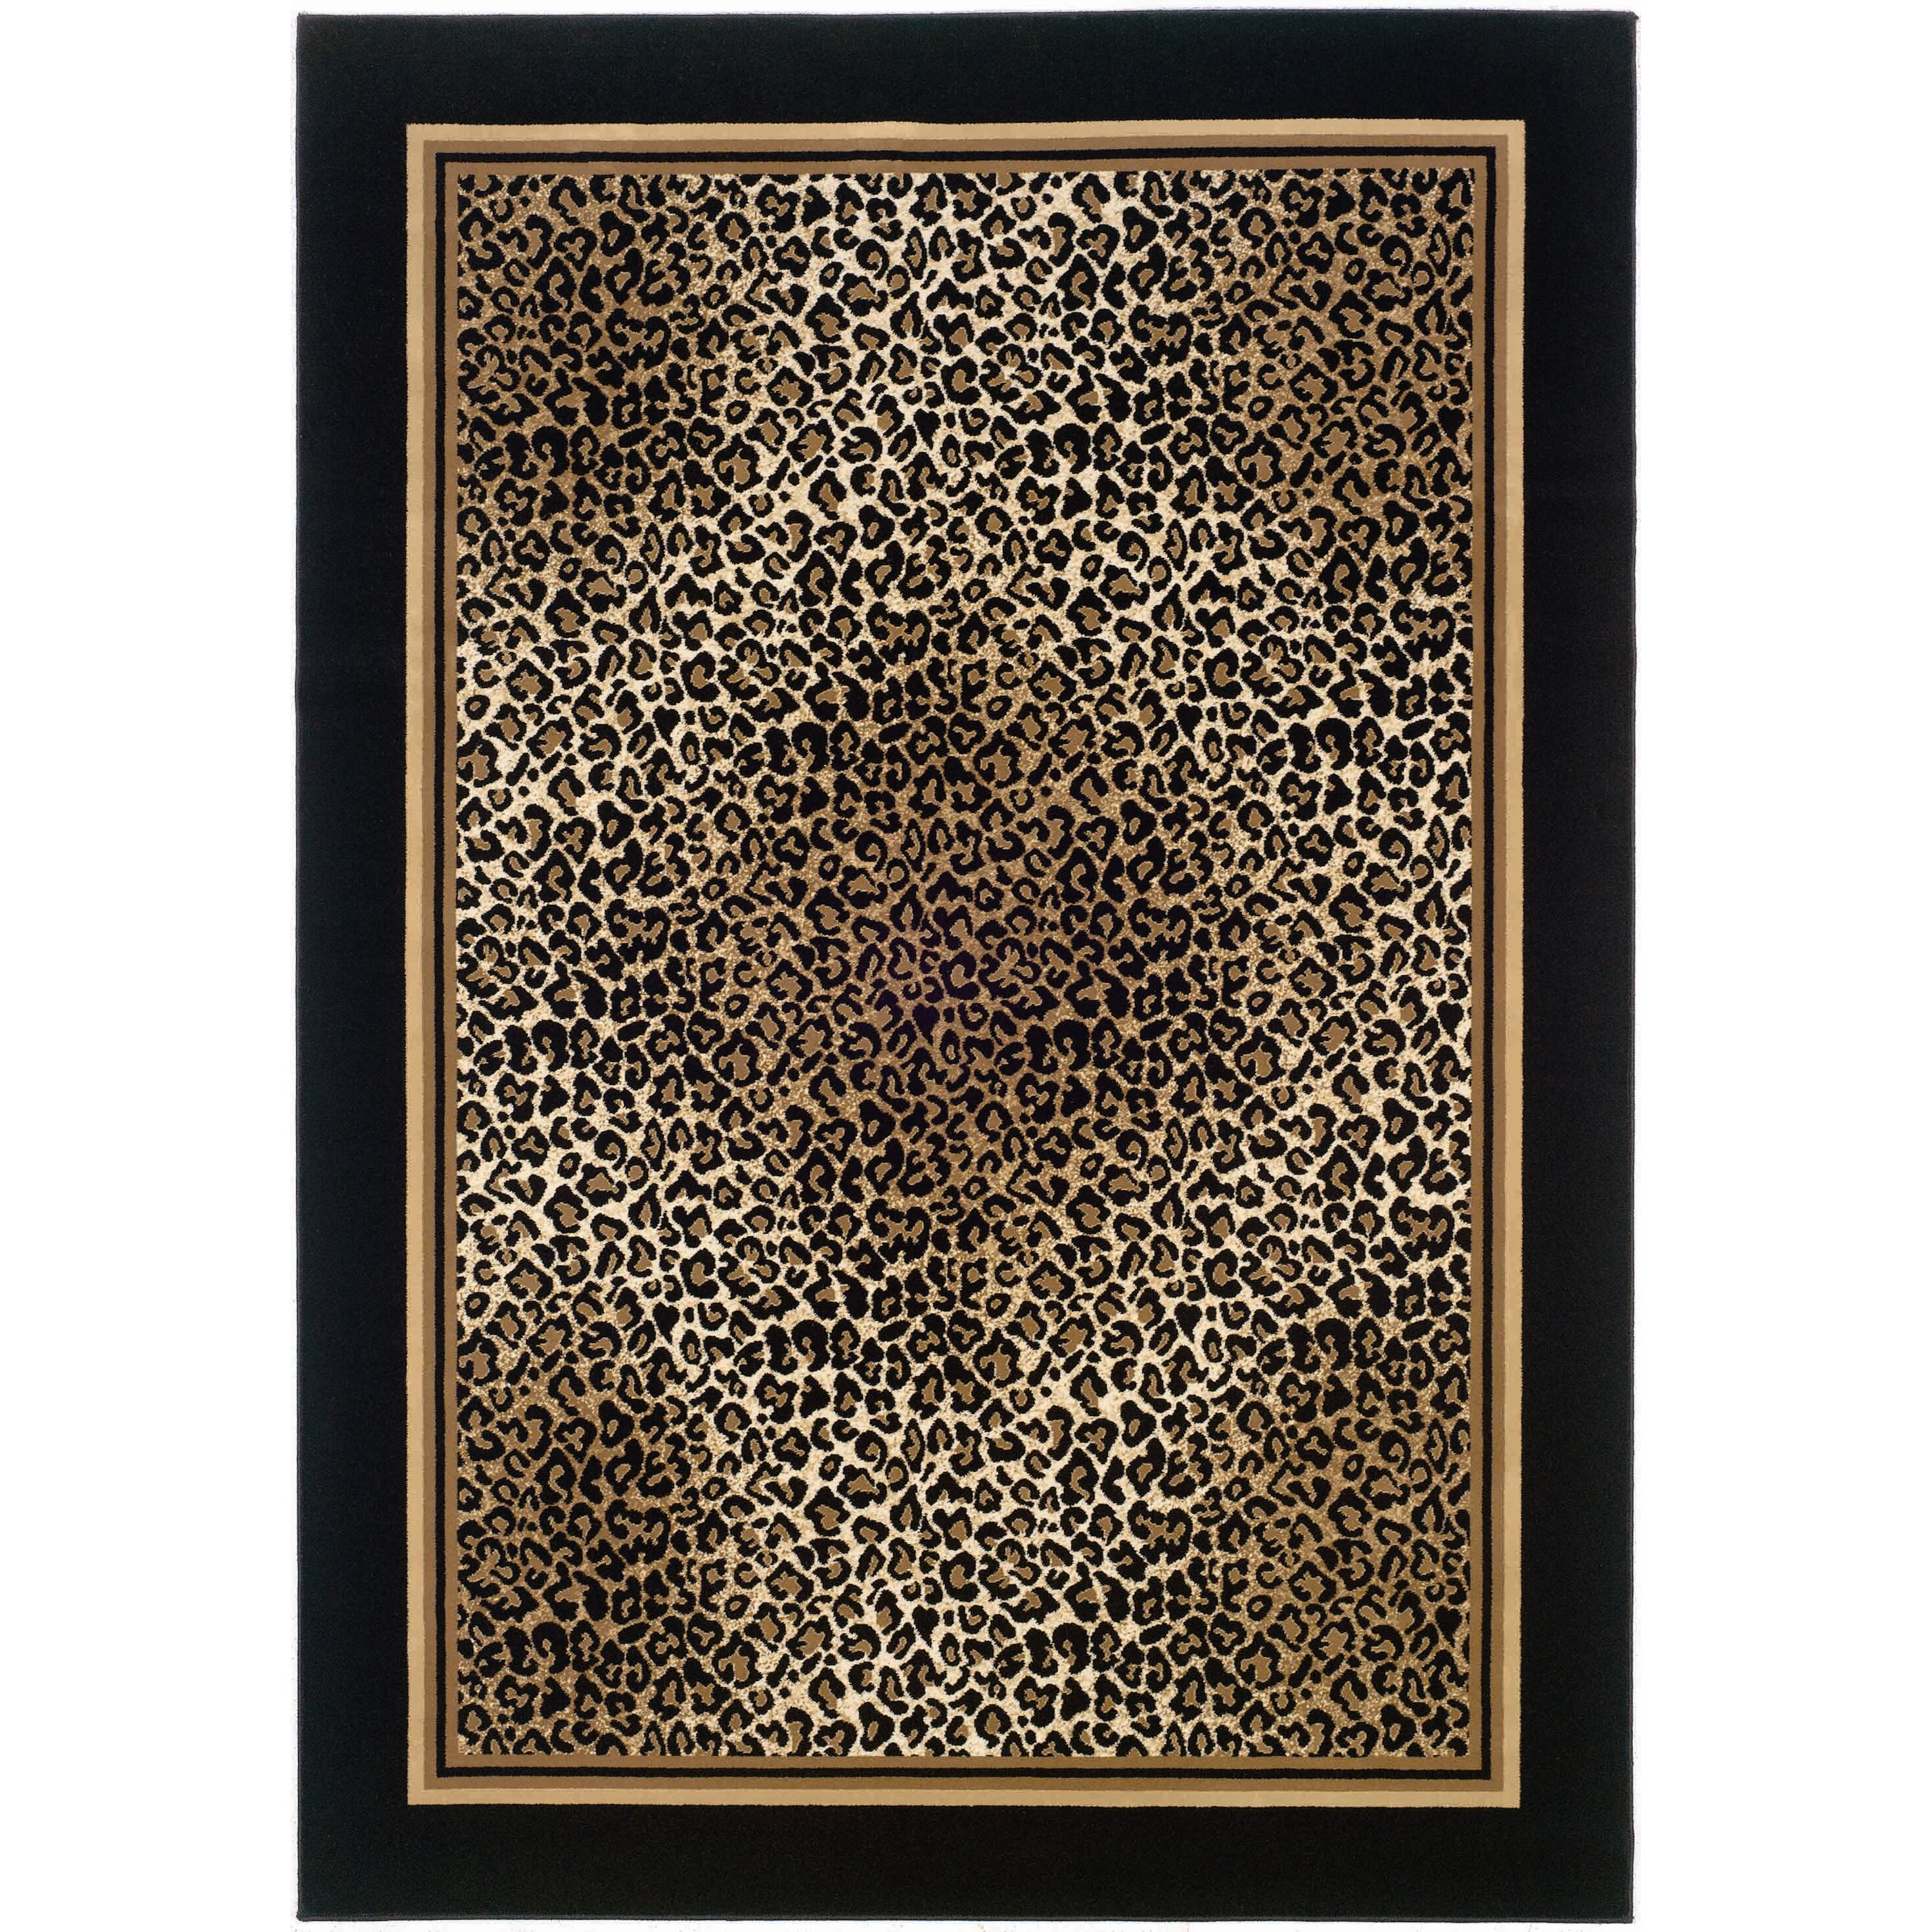 Animal Print Rug Wayfair: Couristan Everest Black Leopard Area Rug & Reviews